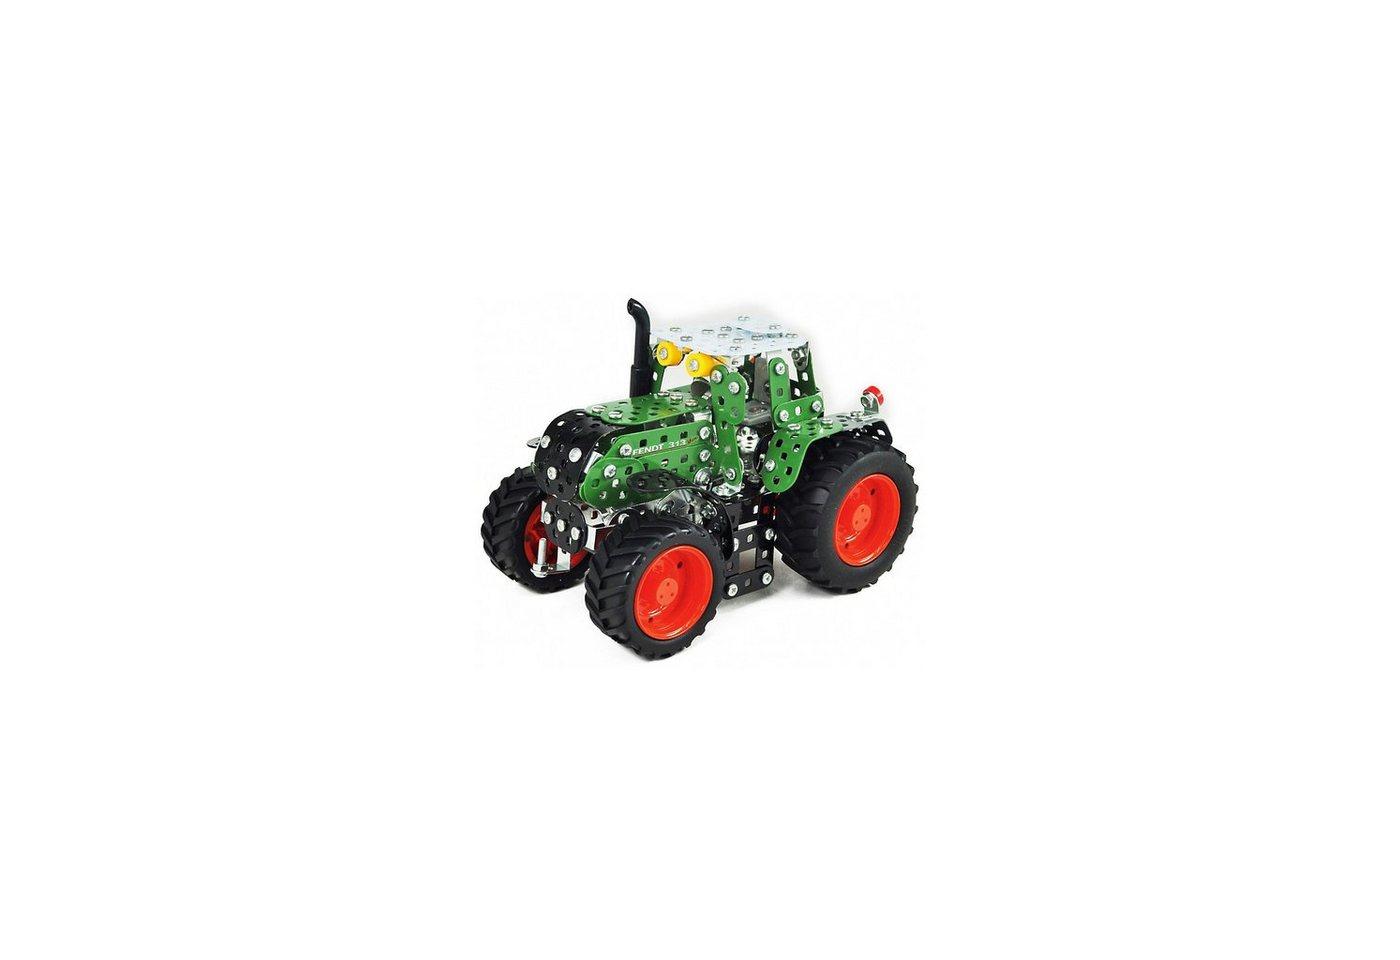 TRONICO Metallbaukasten Traktor, Fendt 313 VARIO, 1:32, 394t